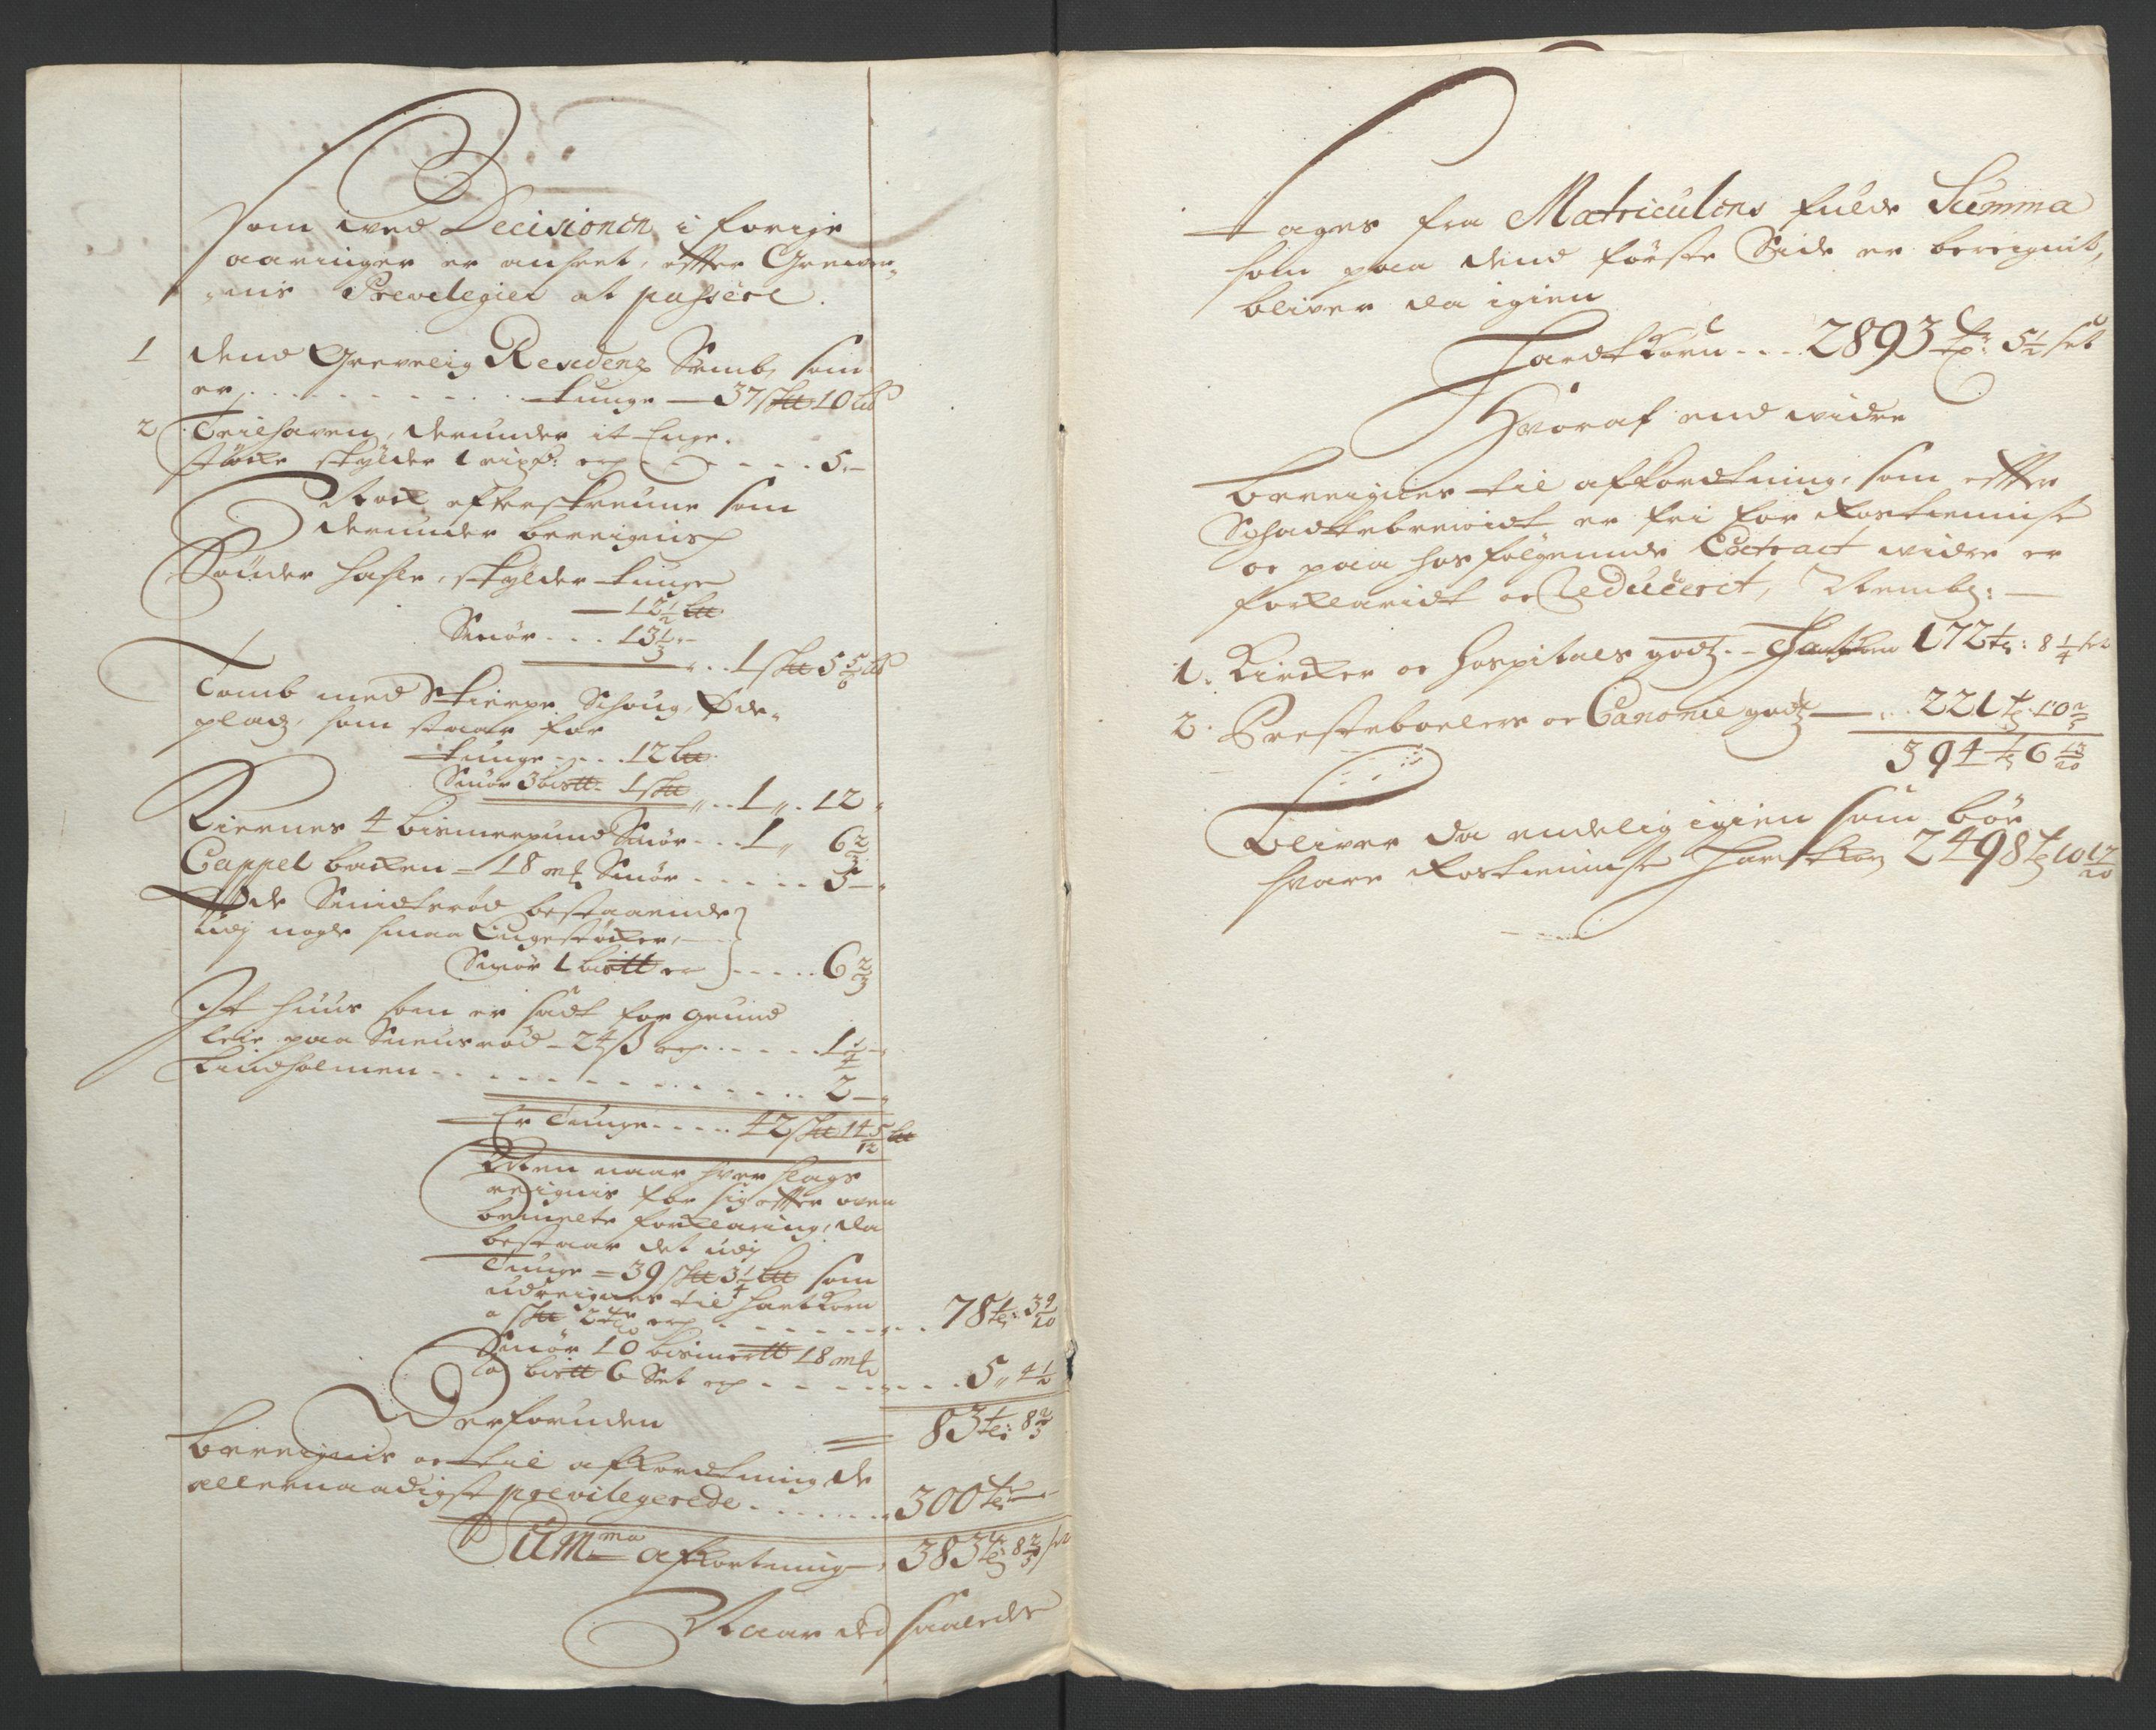 RA, Rentekammeret inntil 1814, Reviderte regnskaper, Fogderegnskap, R32/L1864: Fogderegnskap Jarlsberg grevskap, 1691, s. 238